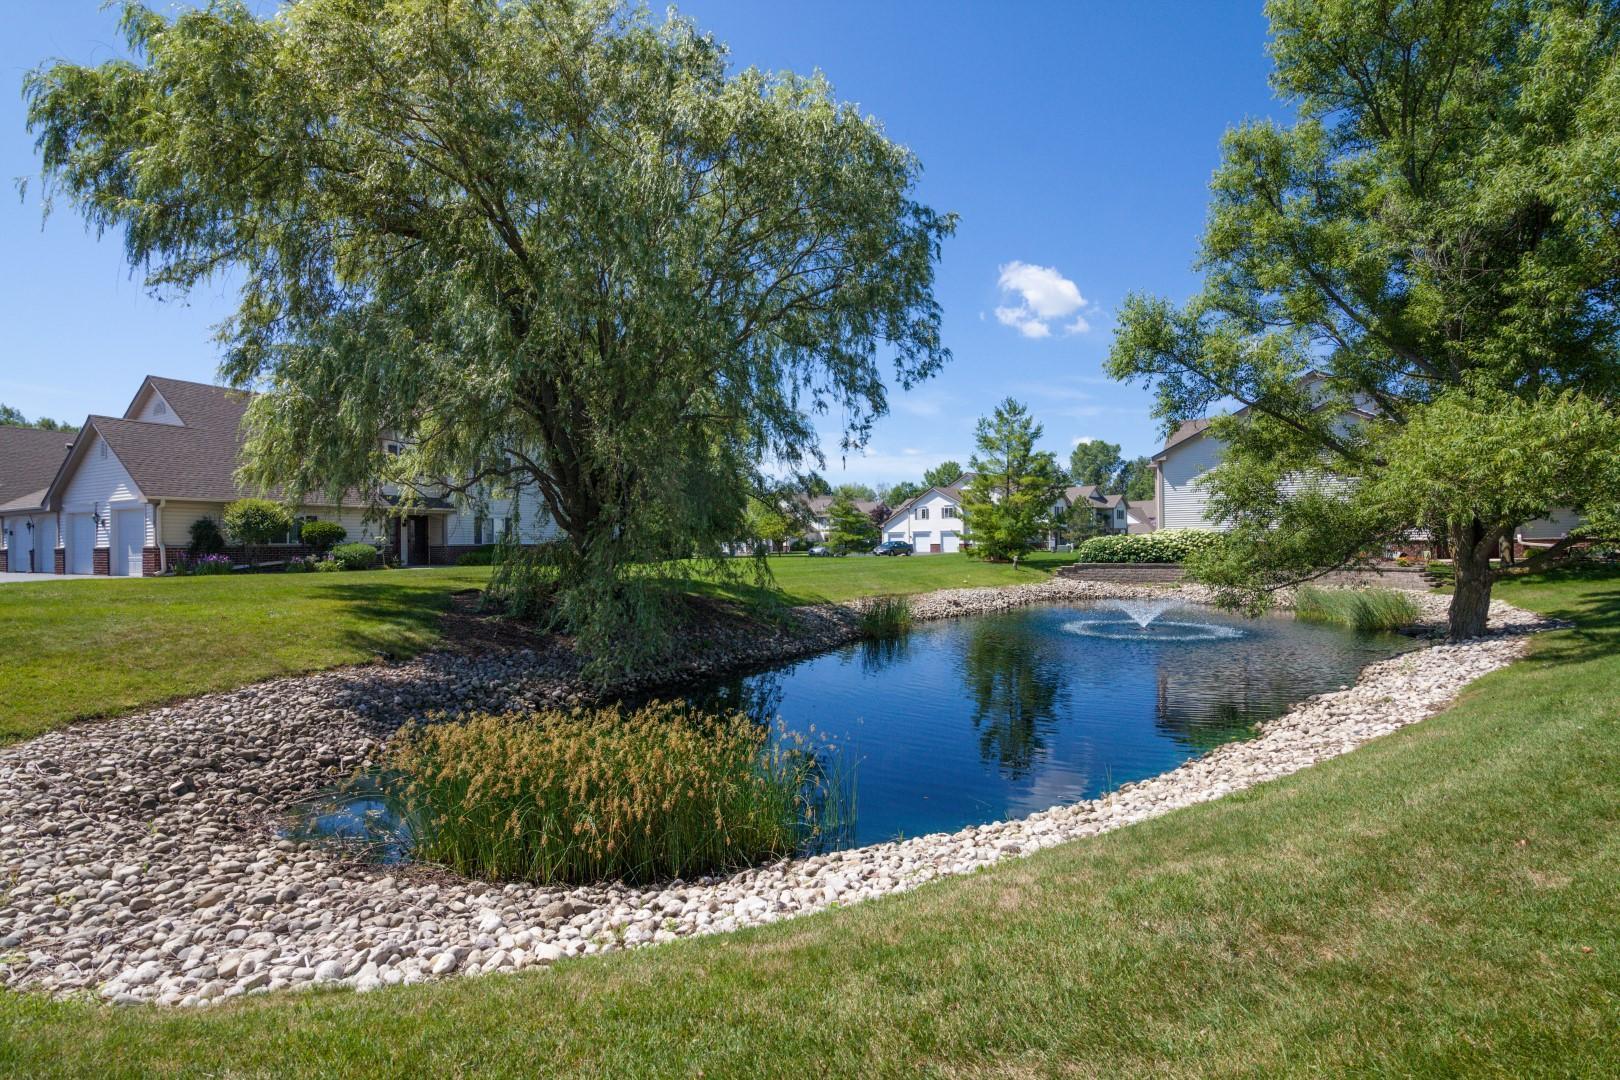 516 Pewaukee Rd, Pewaukee, Wisconsin 53072, 1 Bedroom Bedrooms, 5 Rooms Rooms,1 BathroomBathrooms,Condominiums,For Sale,Pewaukee Rd,1,1701747